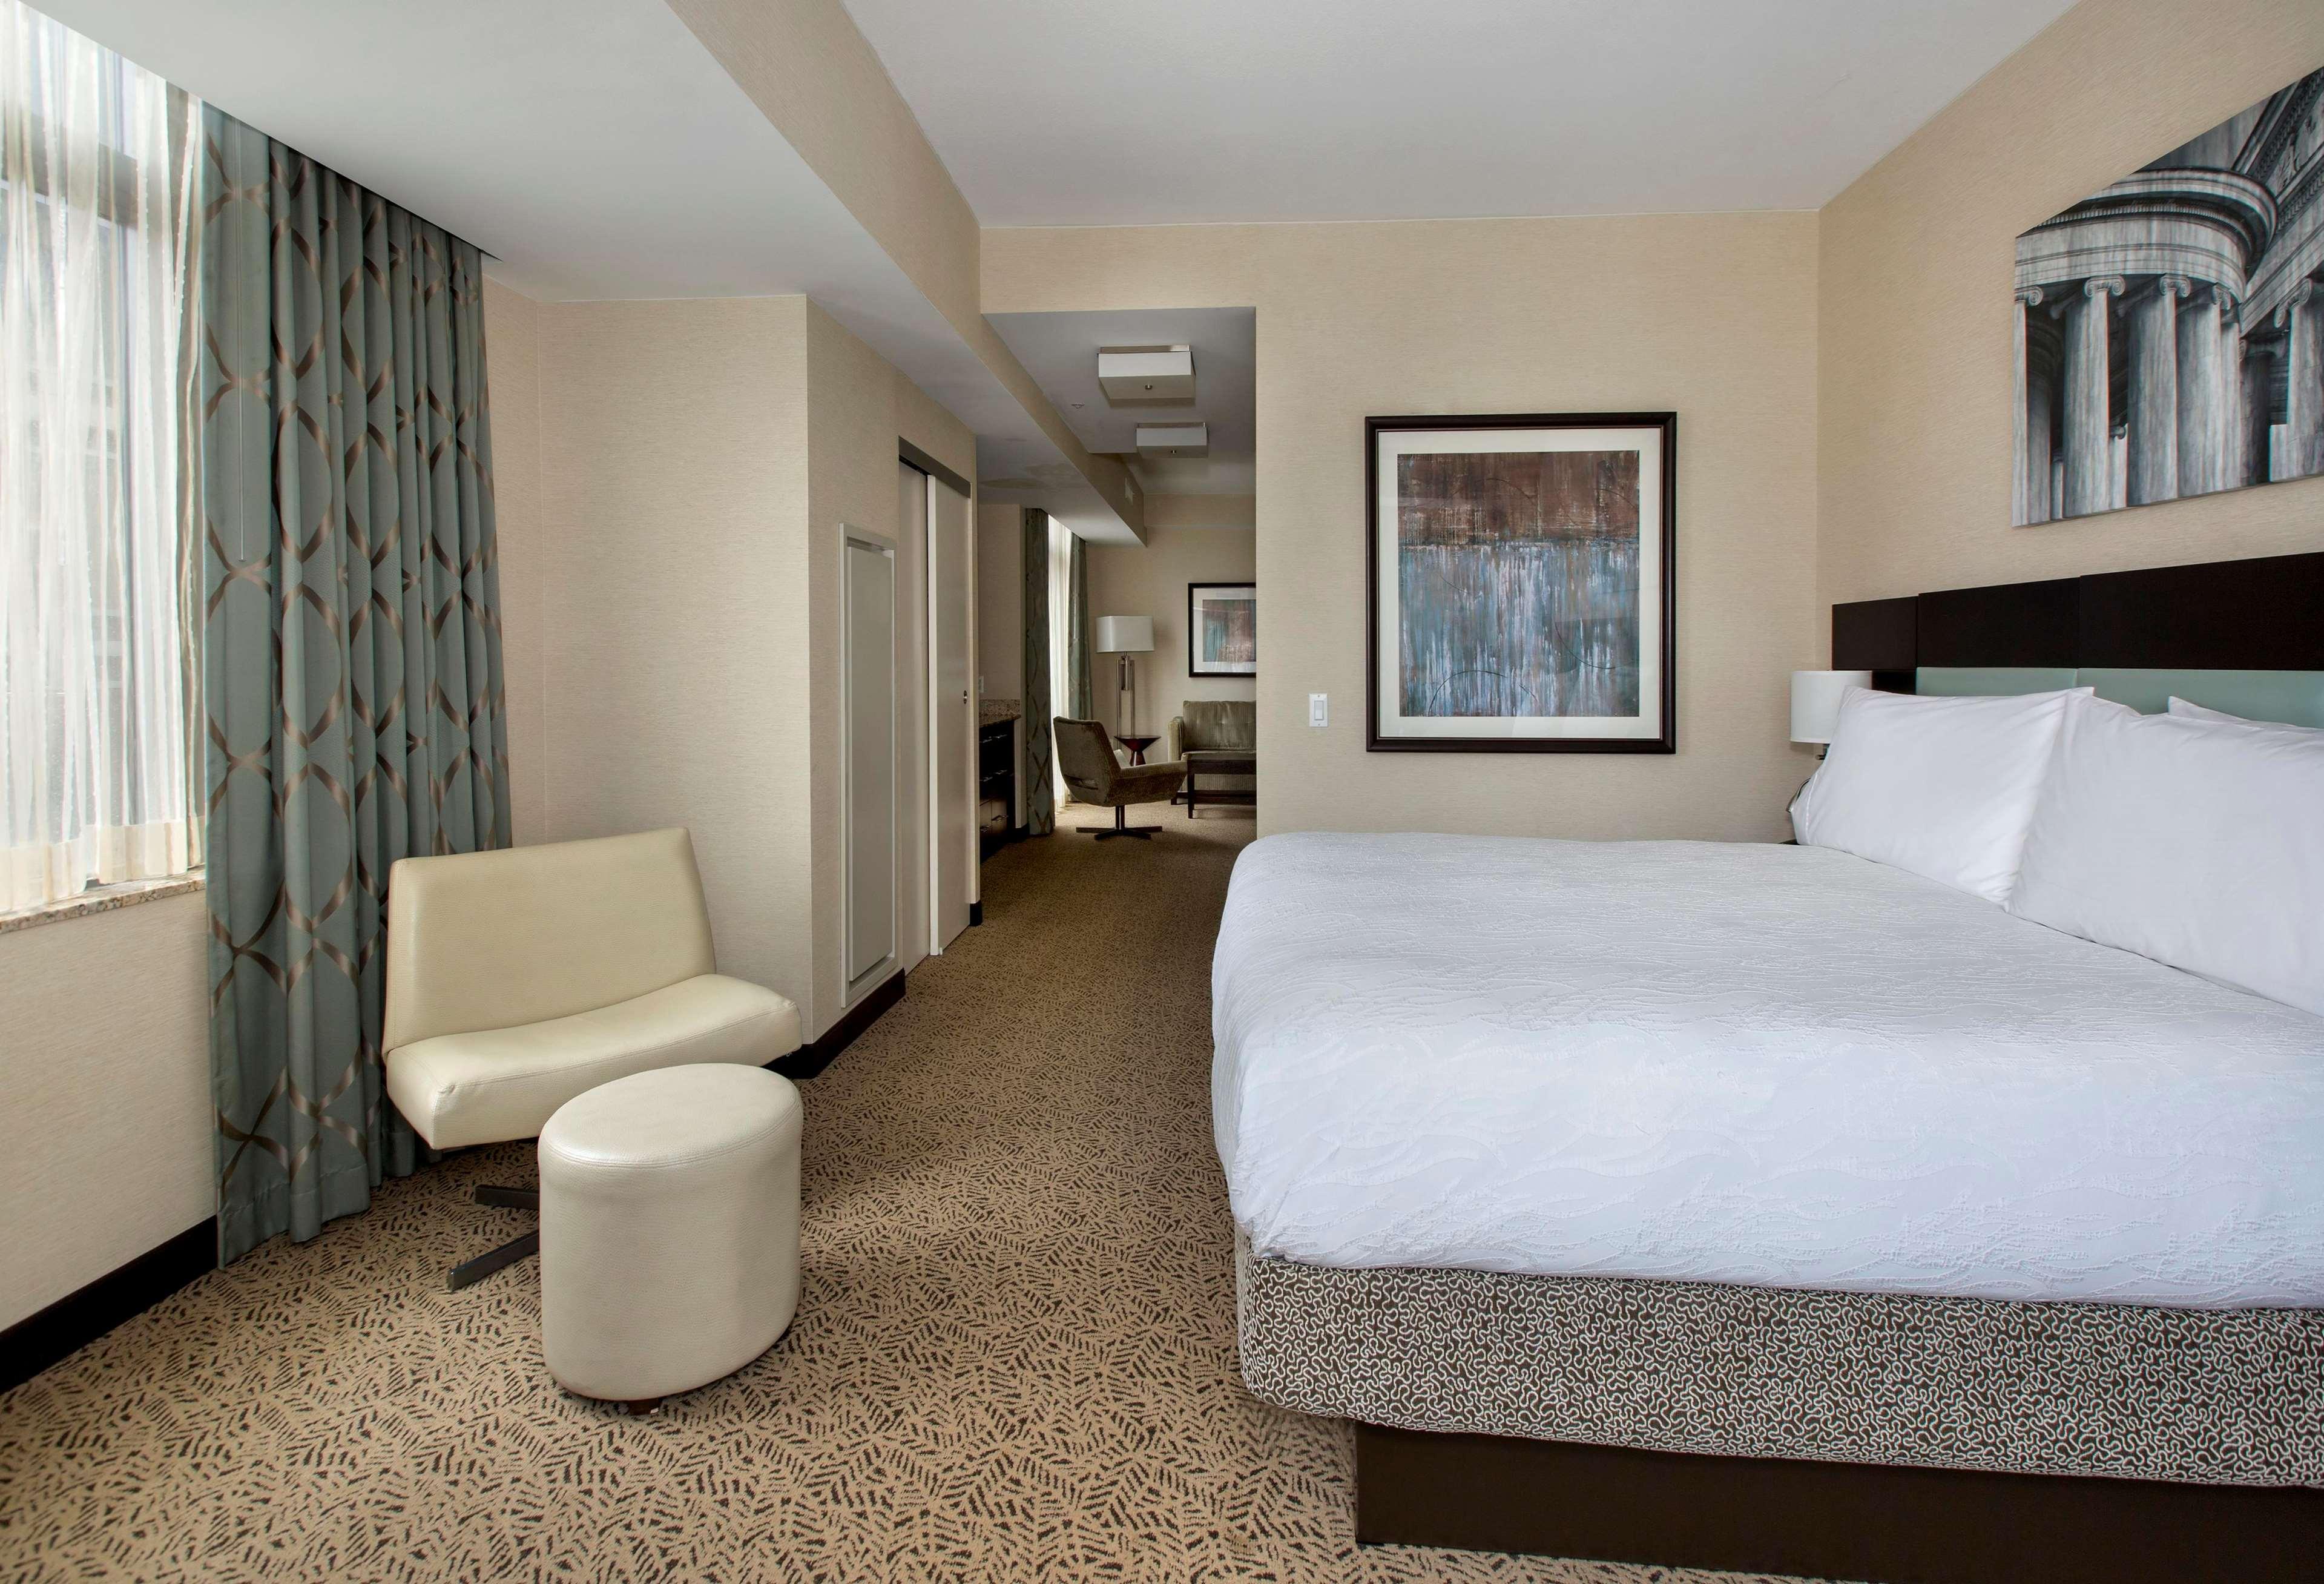 Hilton Garden Inn Washington DC/U.S. Capitol image 12